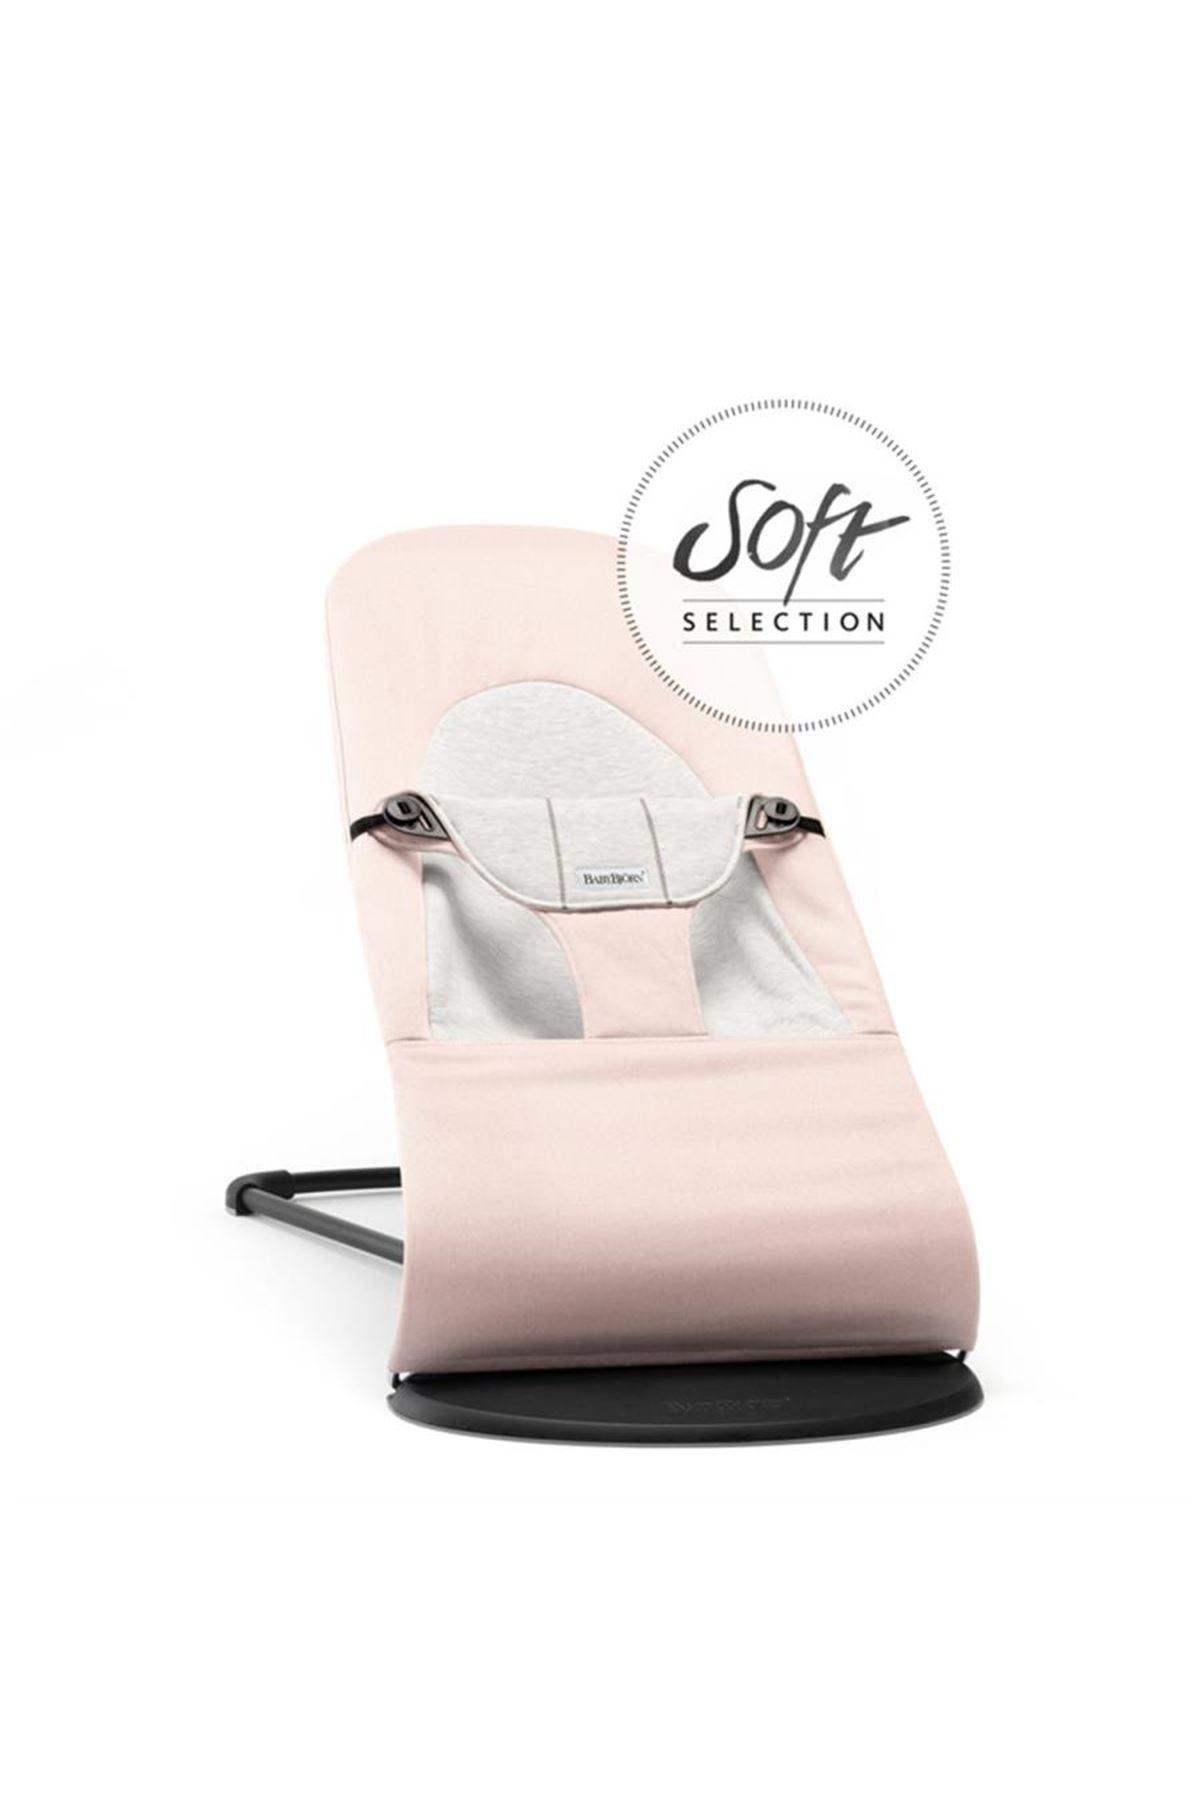 BabyBjörn Balance Soft Ana Kucağı Light Pink / Grey Cotton Jersey